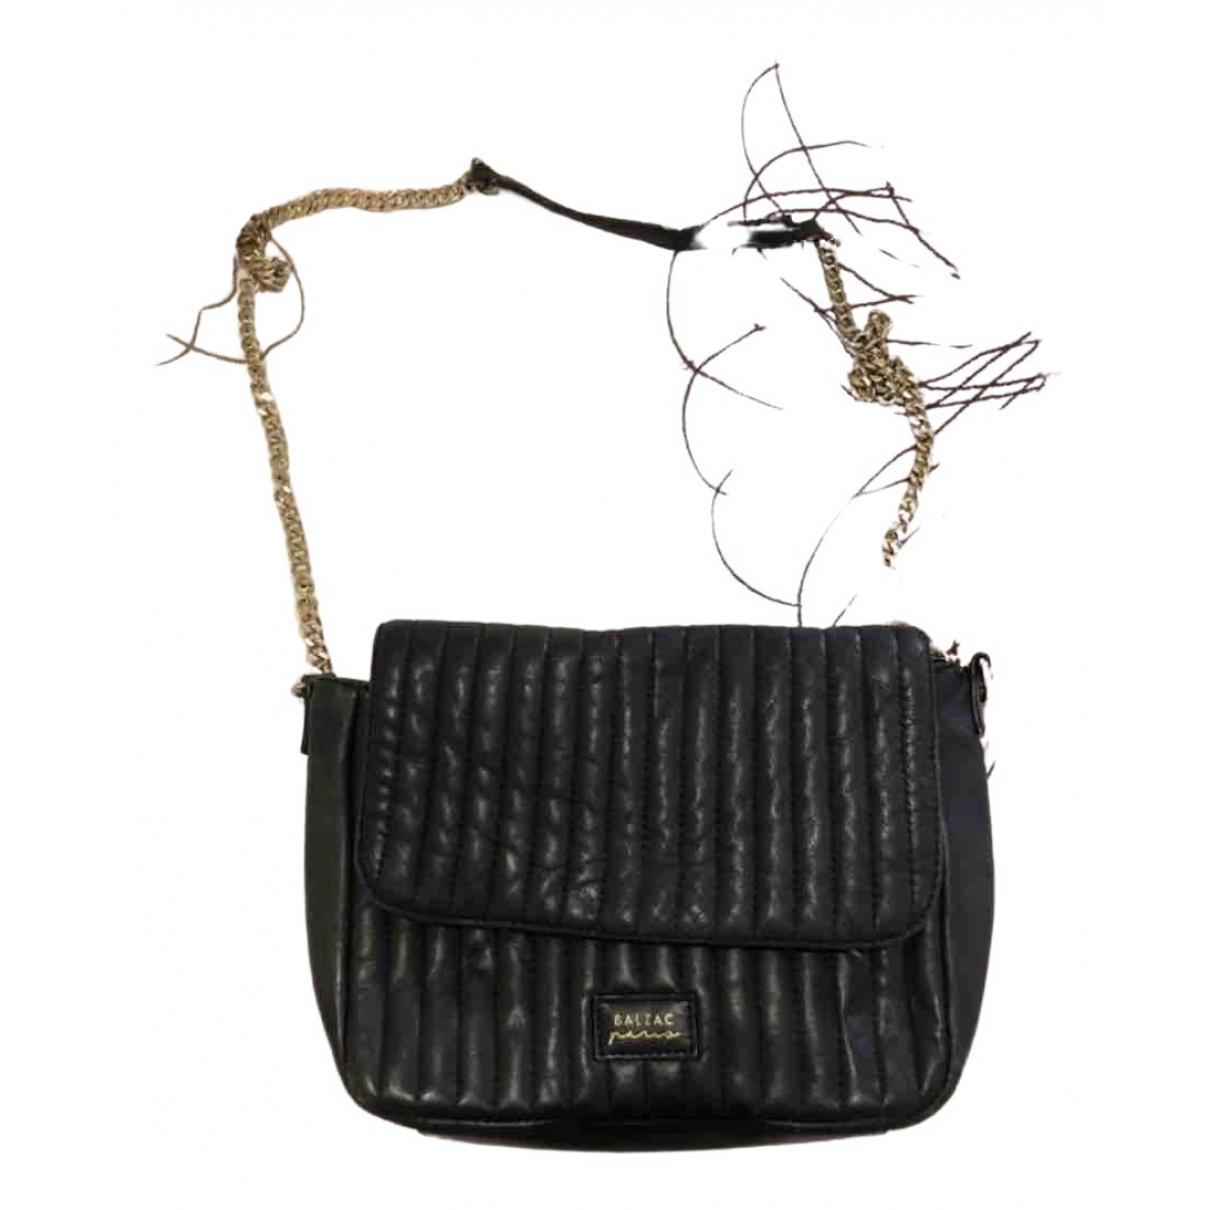 Balzac Paris \N Handtasche in  Schwarz Leder